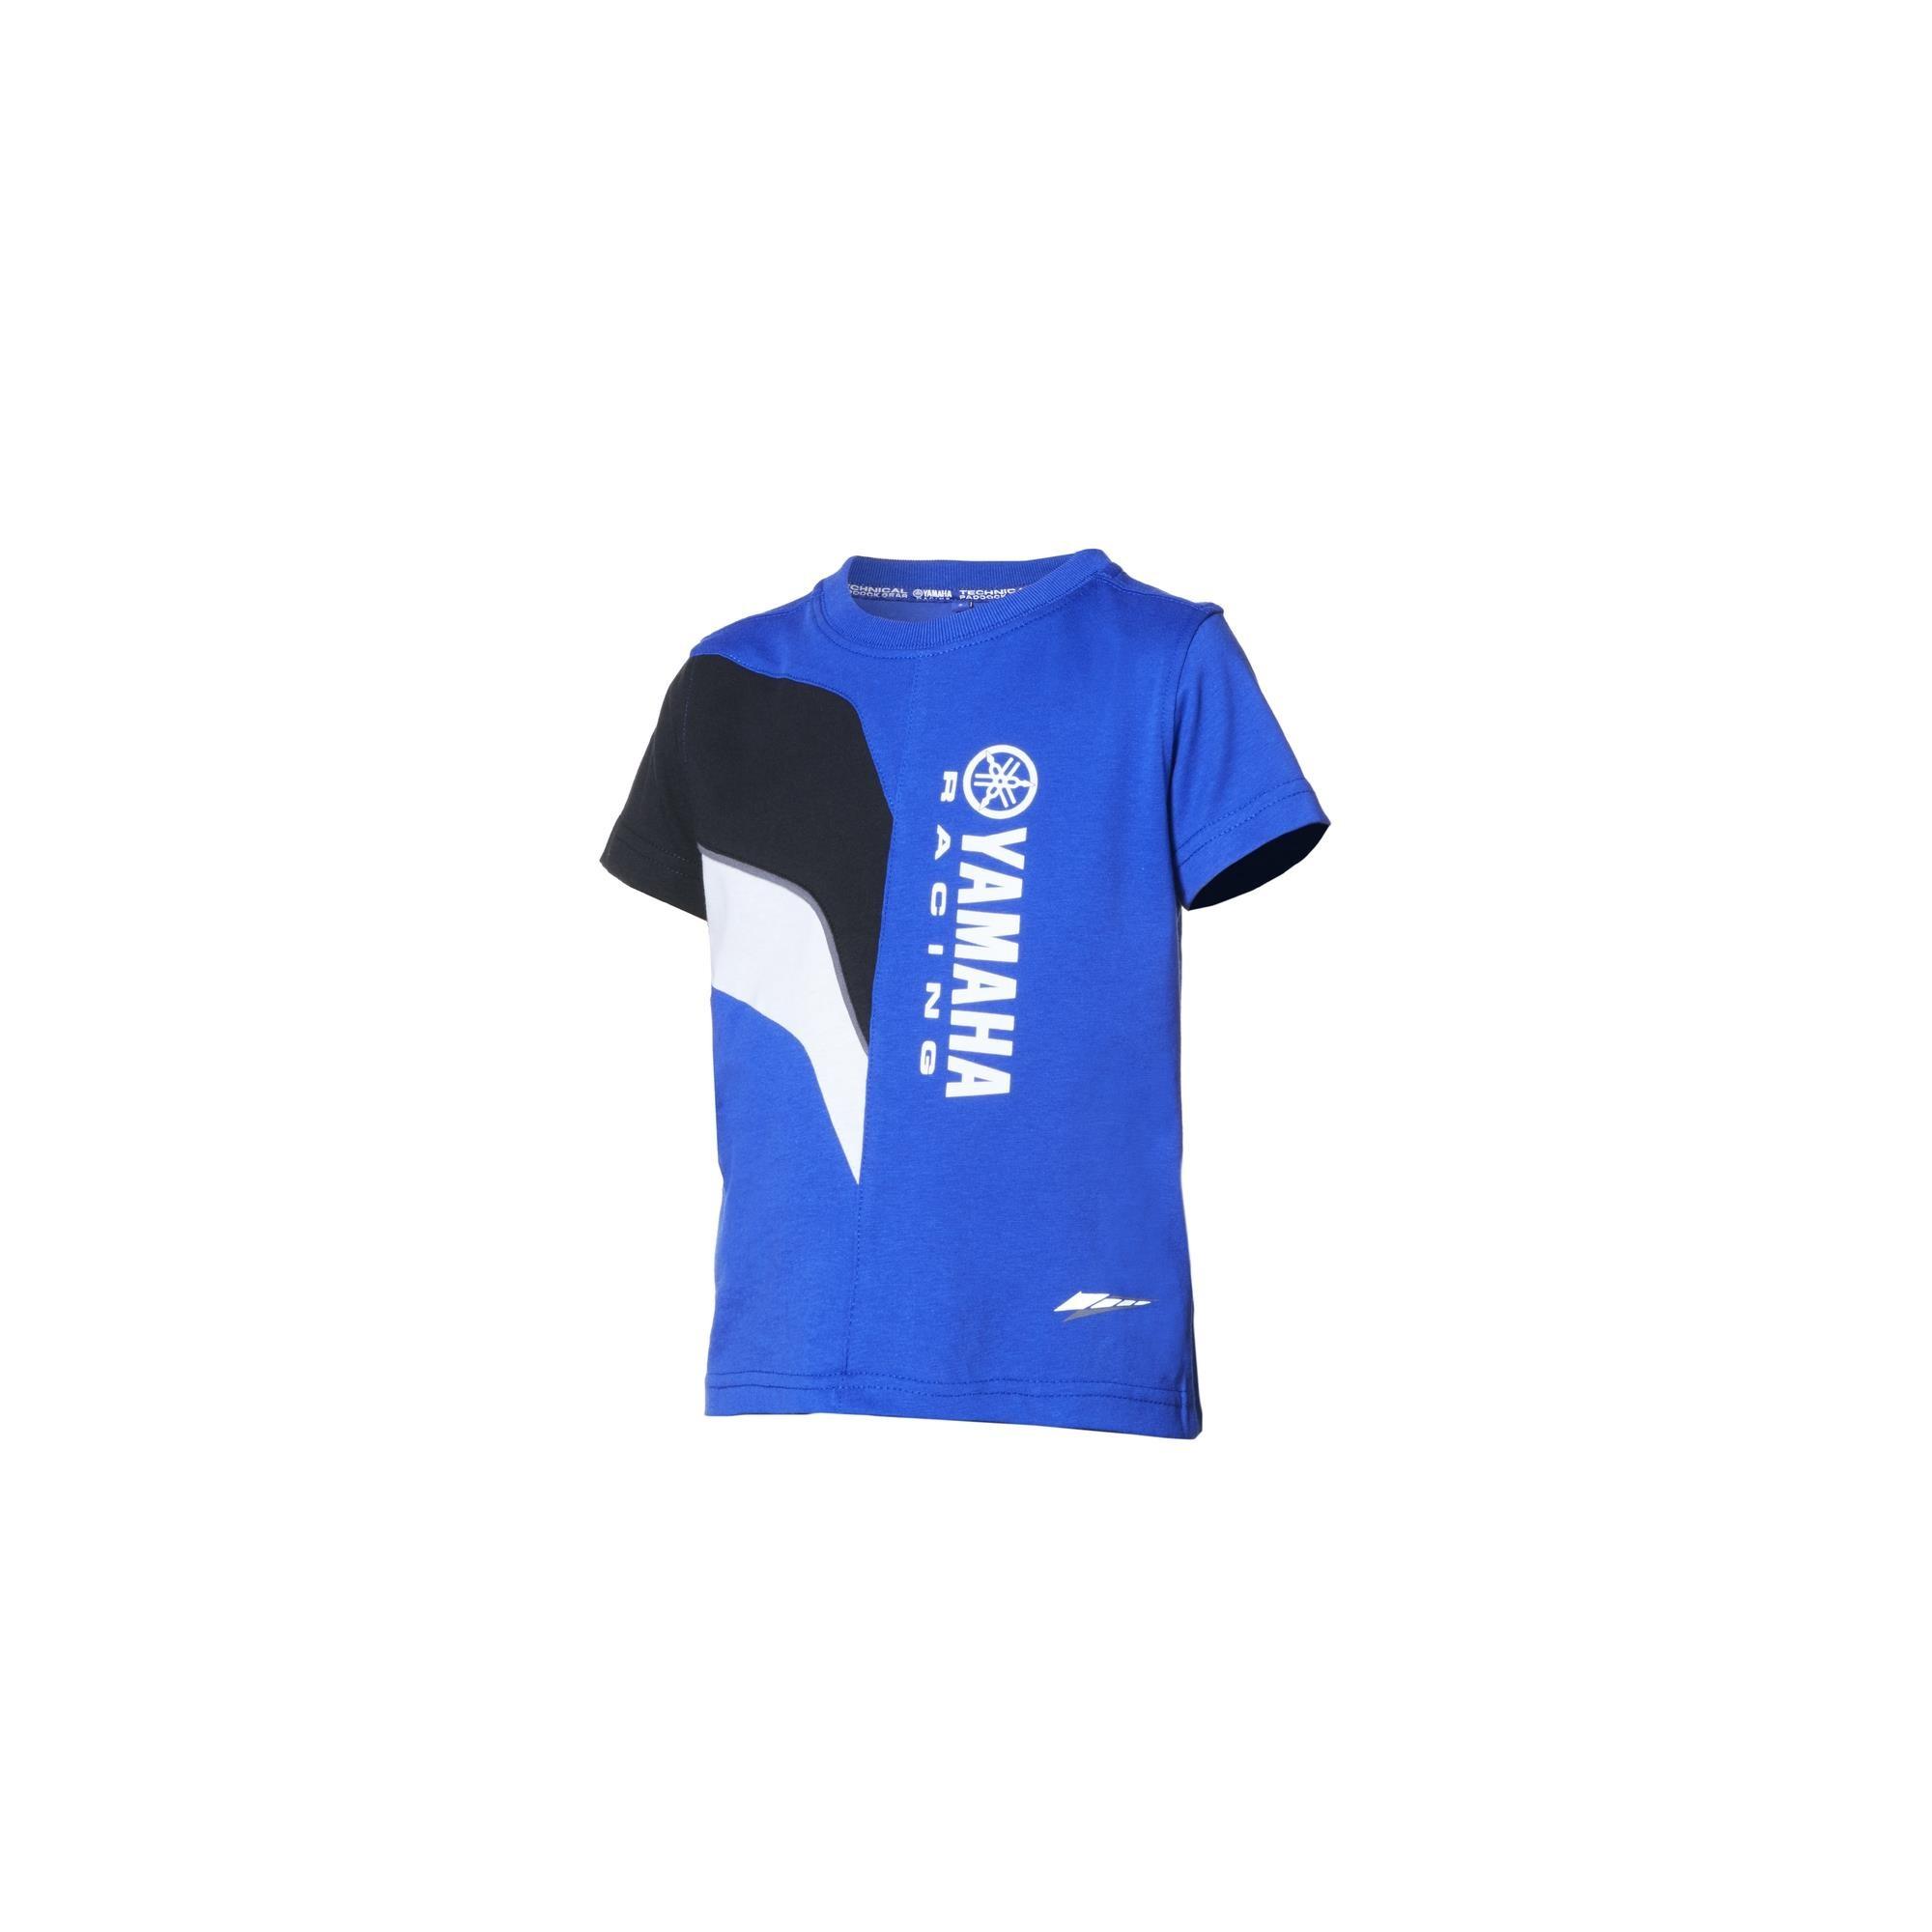 Camiseta Paddock Blue 2016